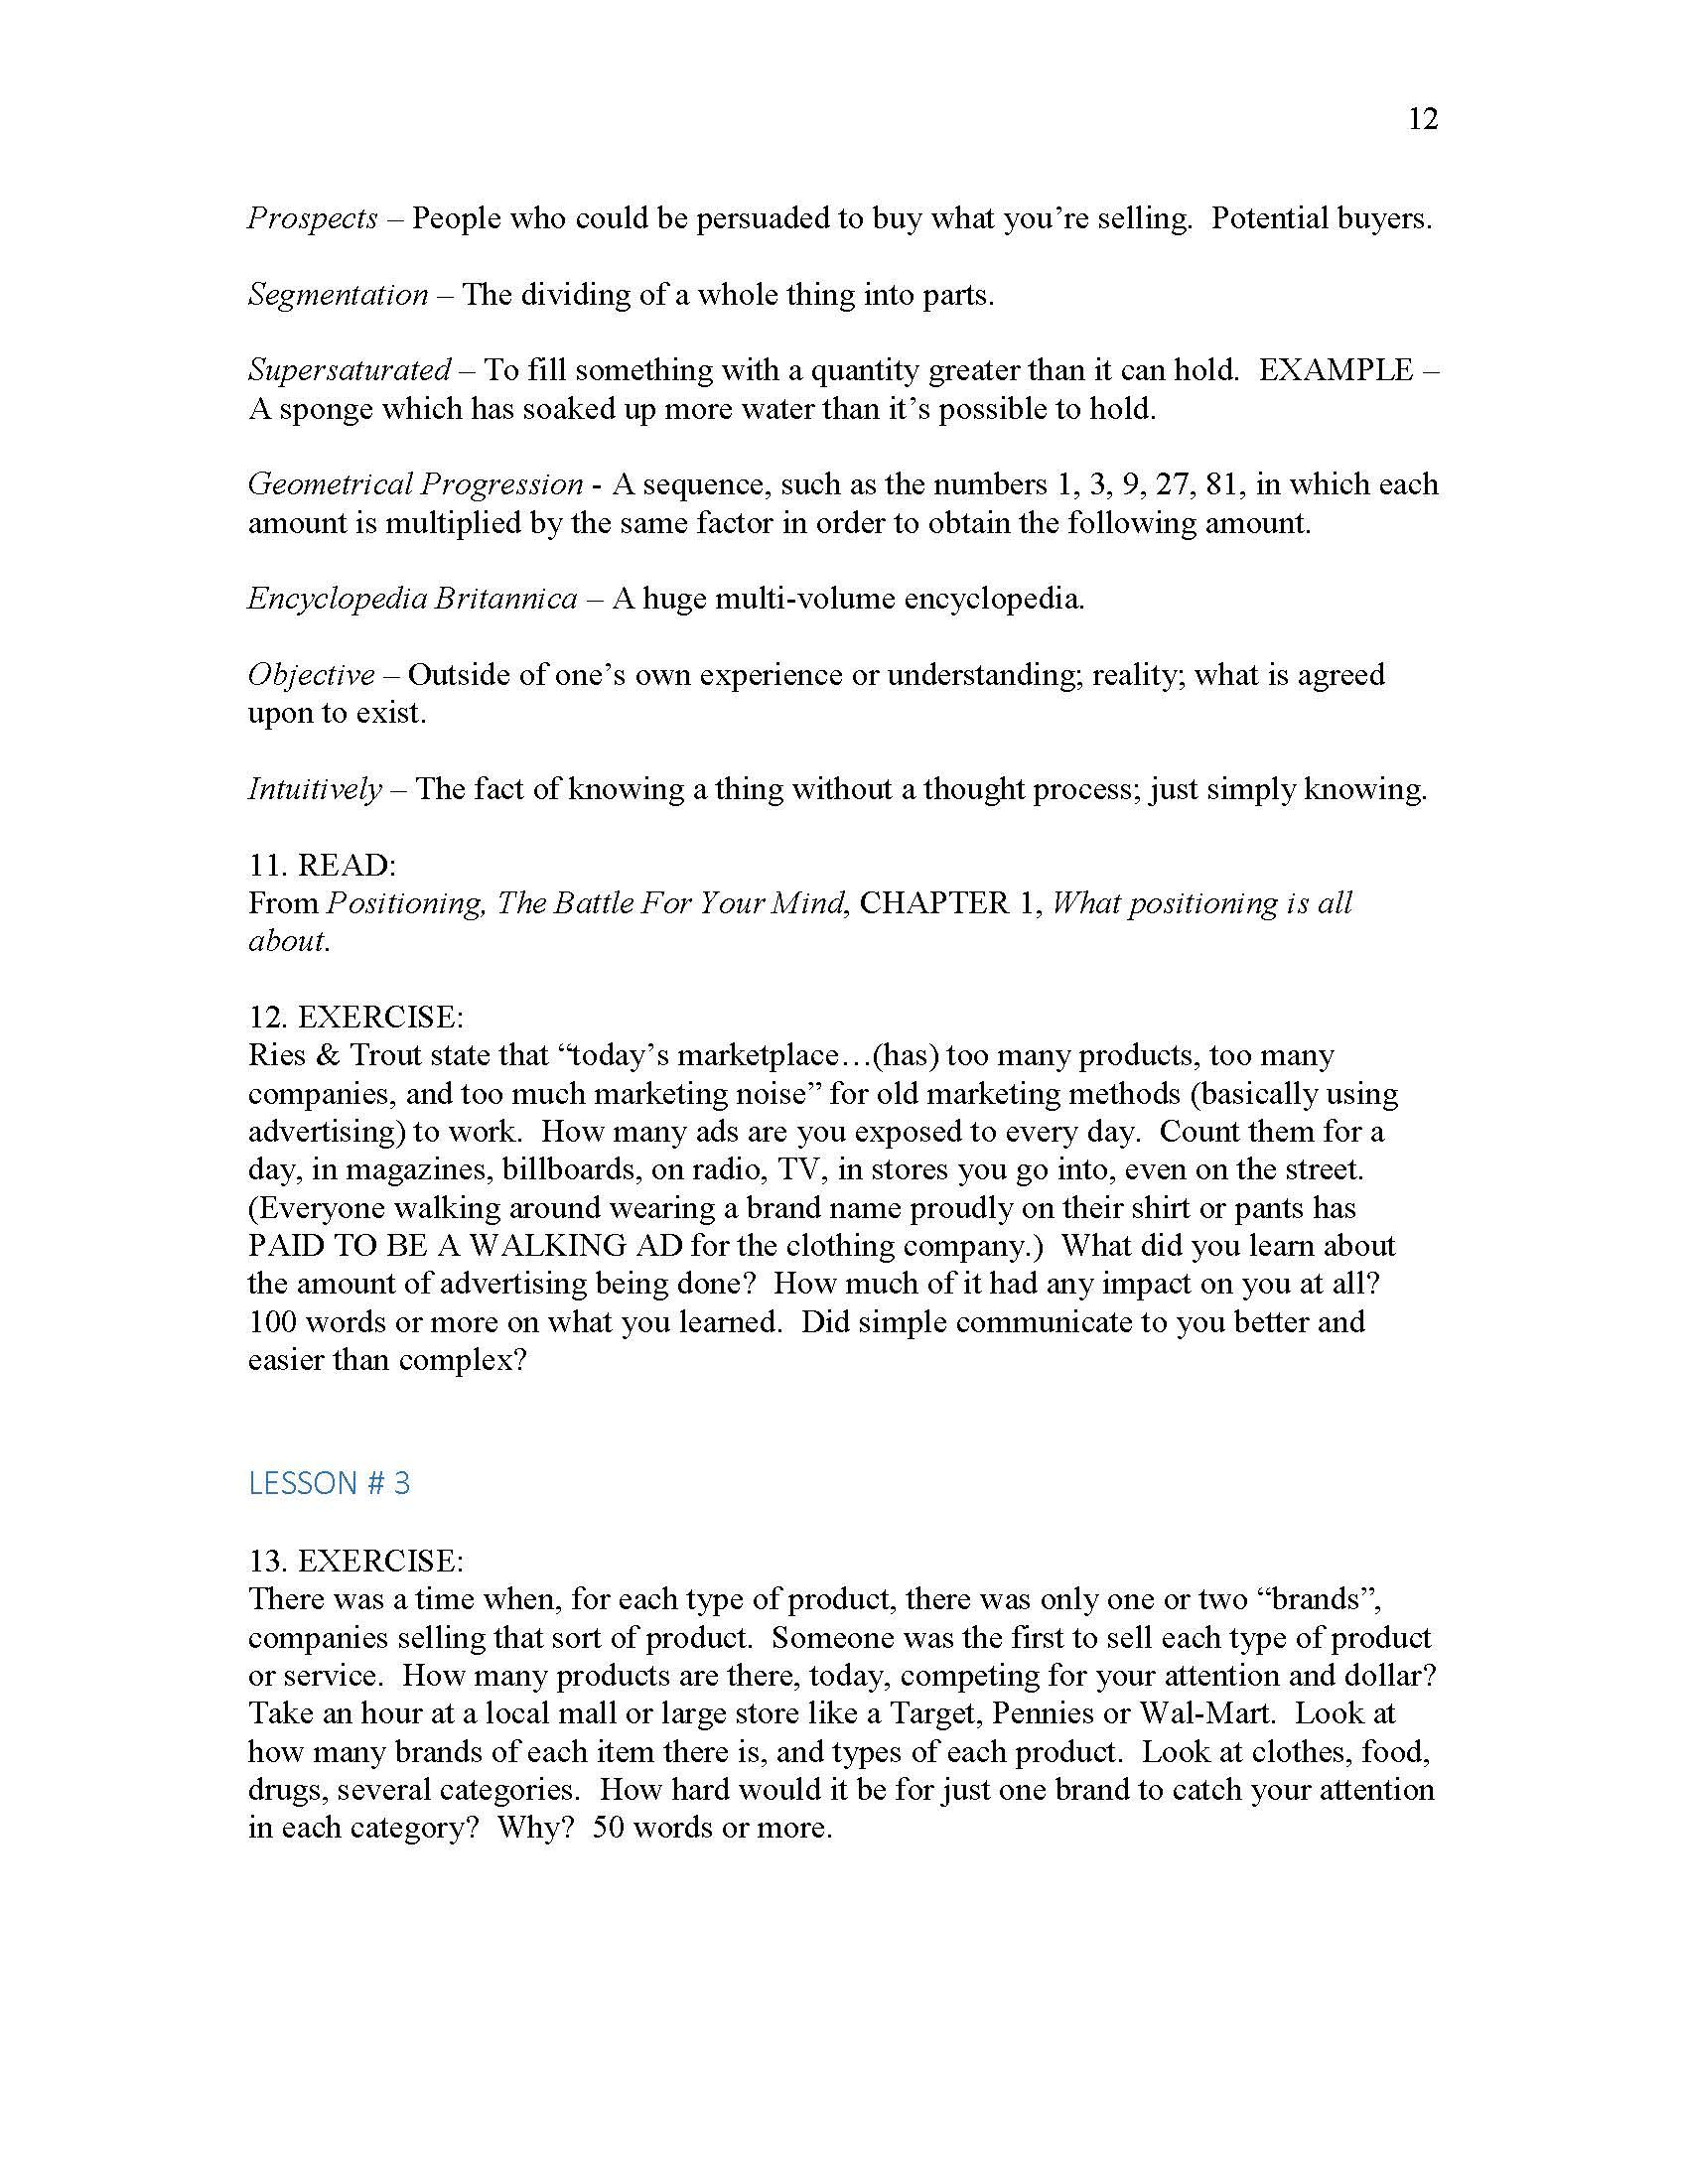 Step 4+ Creative Writing Master's Marketing & P.R._Page_013.jpg